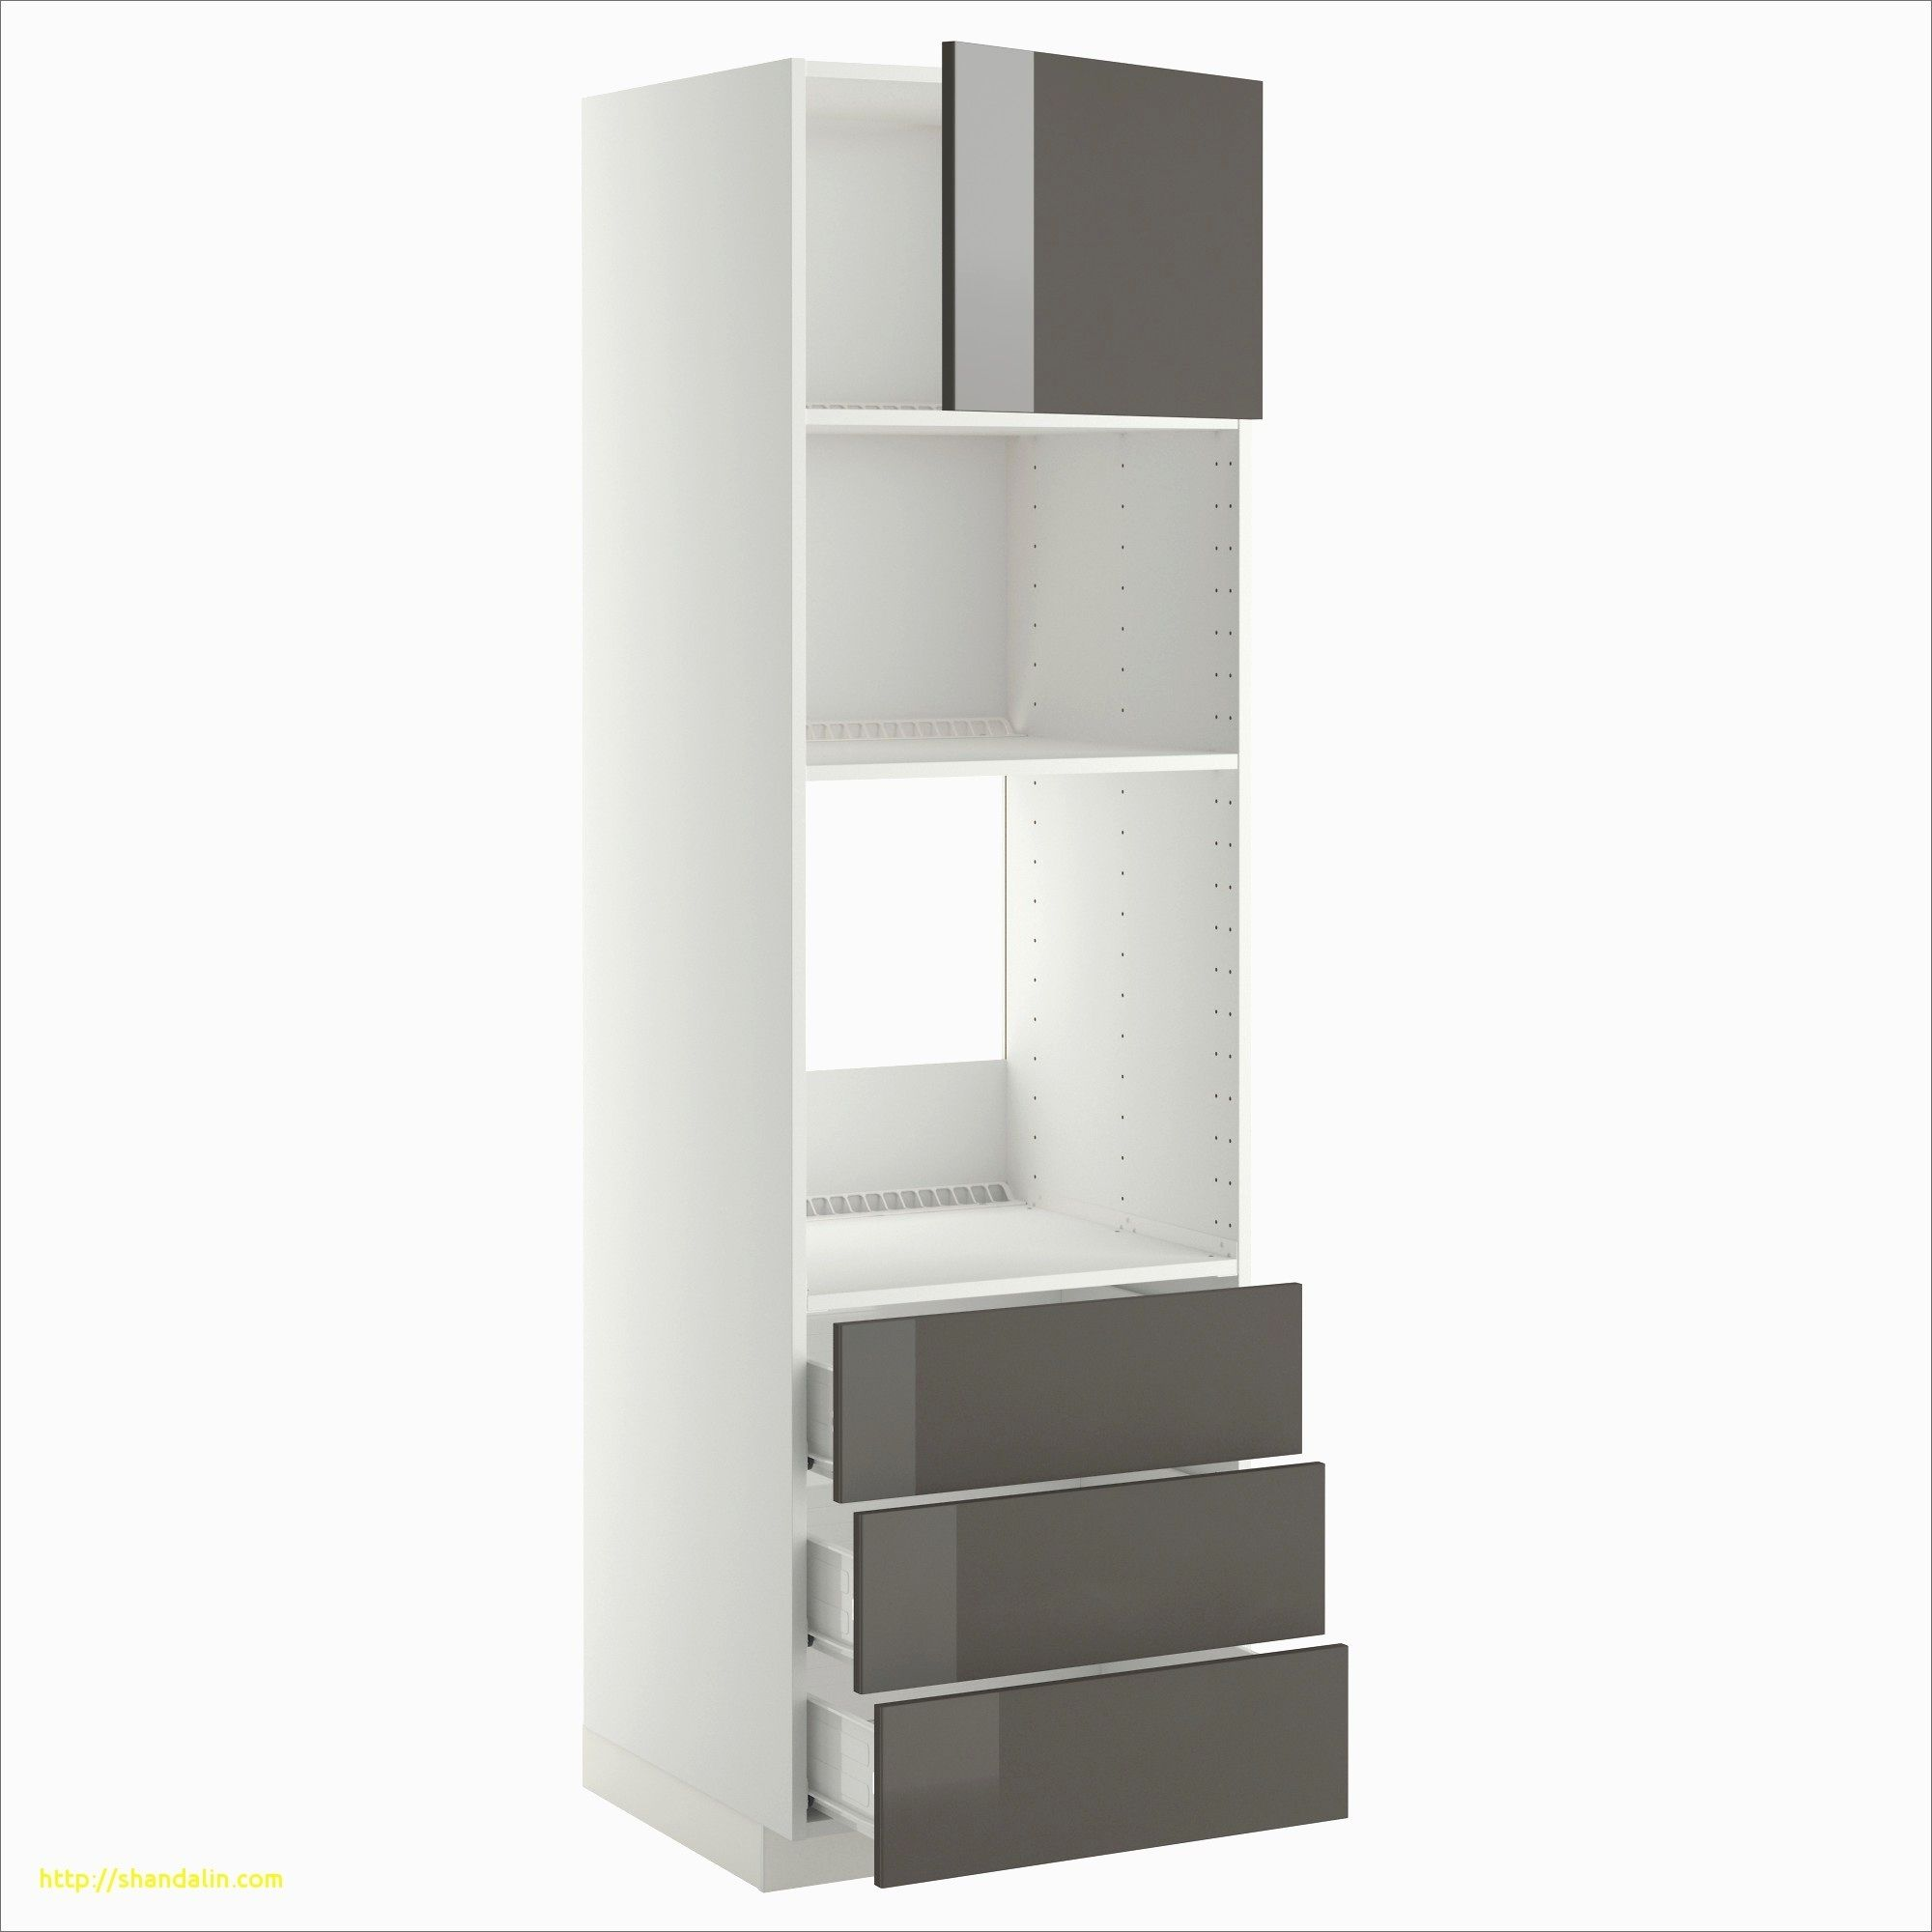 Colonne Four Et Micro Onde Ikea Ideas Meuble Four Et Plaque Meuble Four Meuble Cuisine